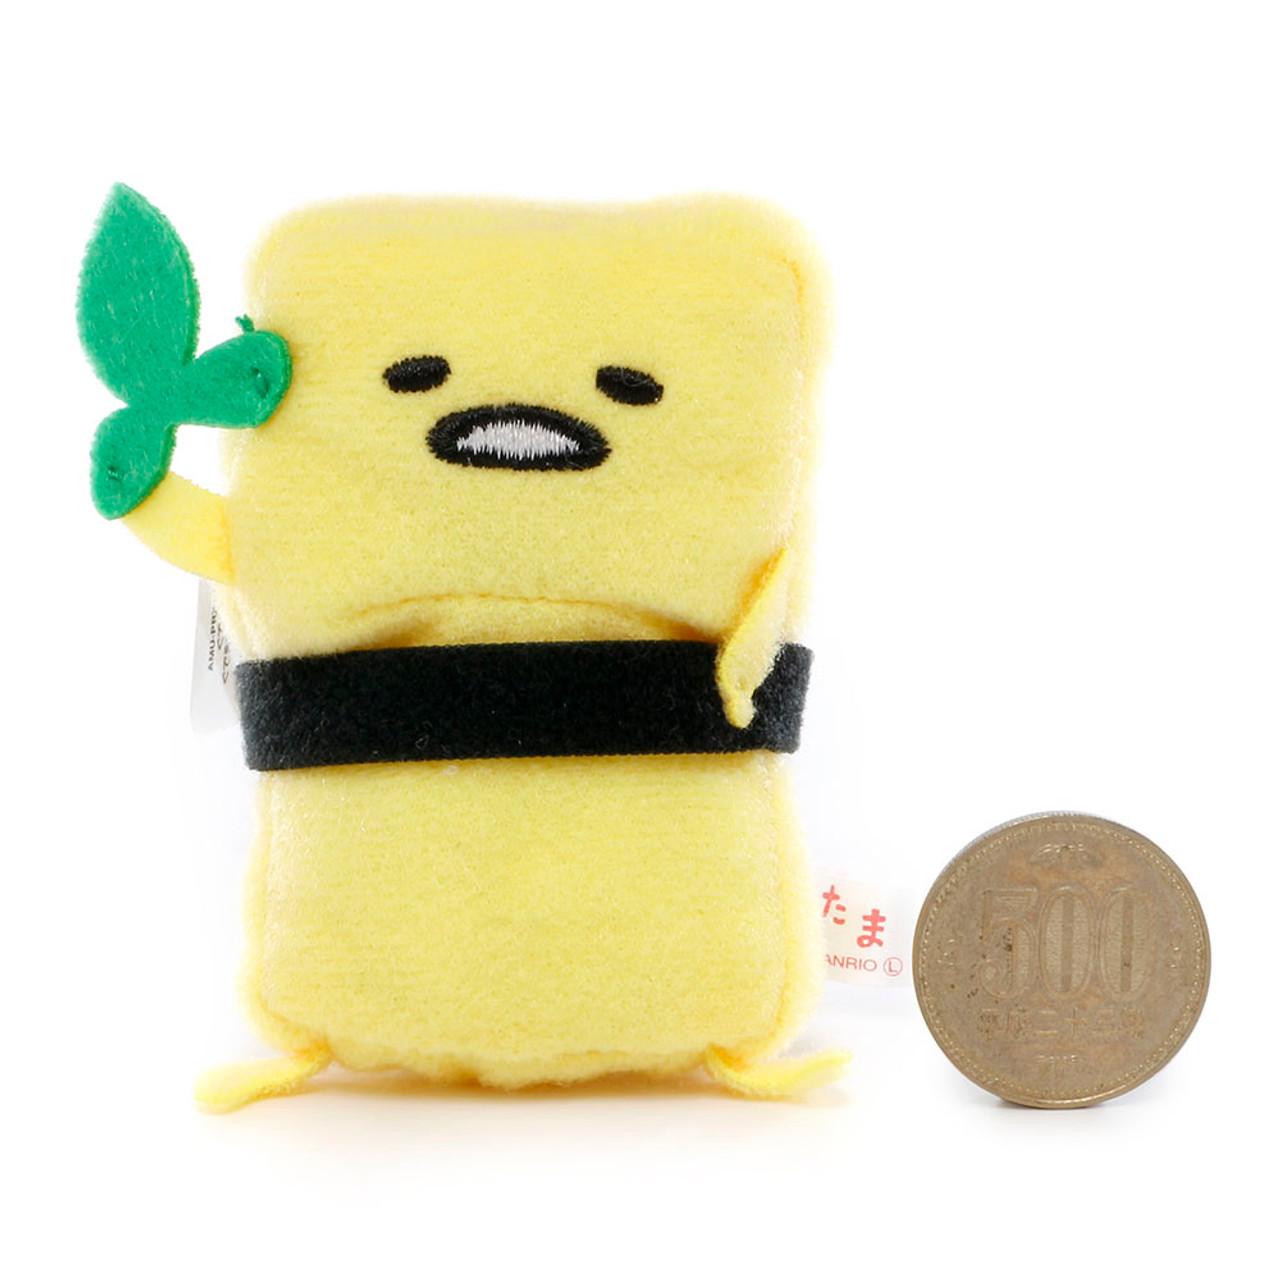 Sanrio Gudetama Lazy Egg Sushi Mascot Plush Charms - Japan Scrambled Sushi ( Proportion )